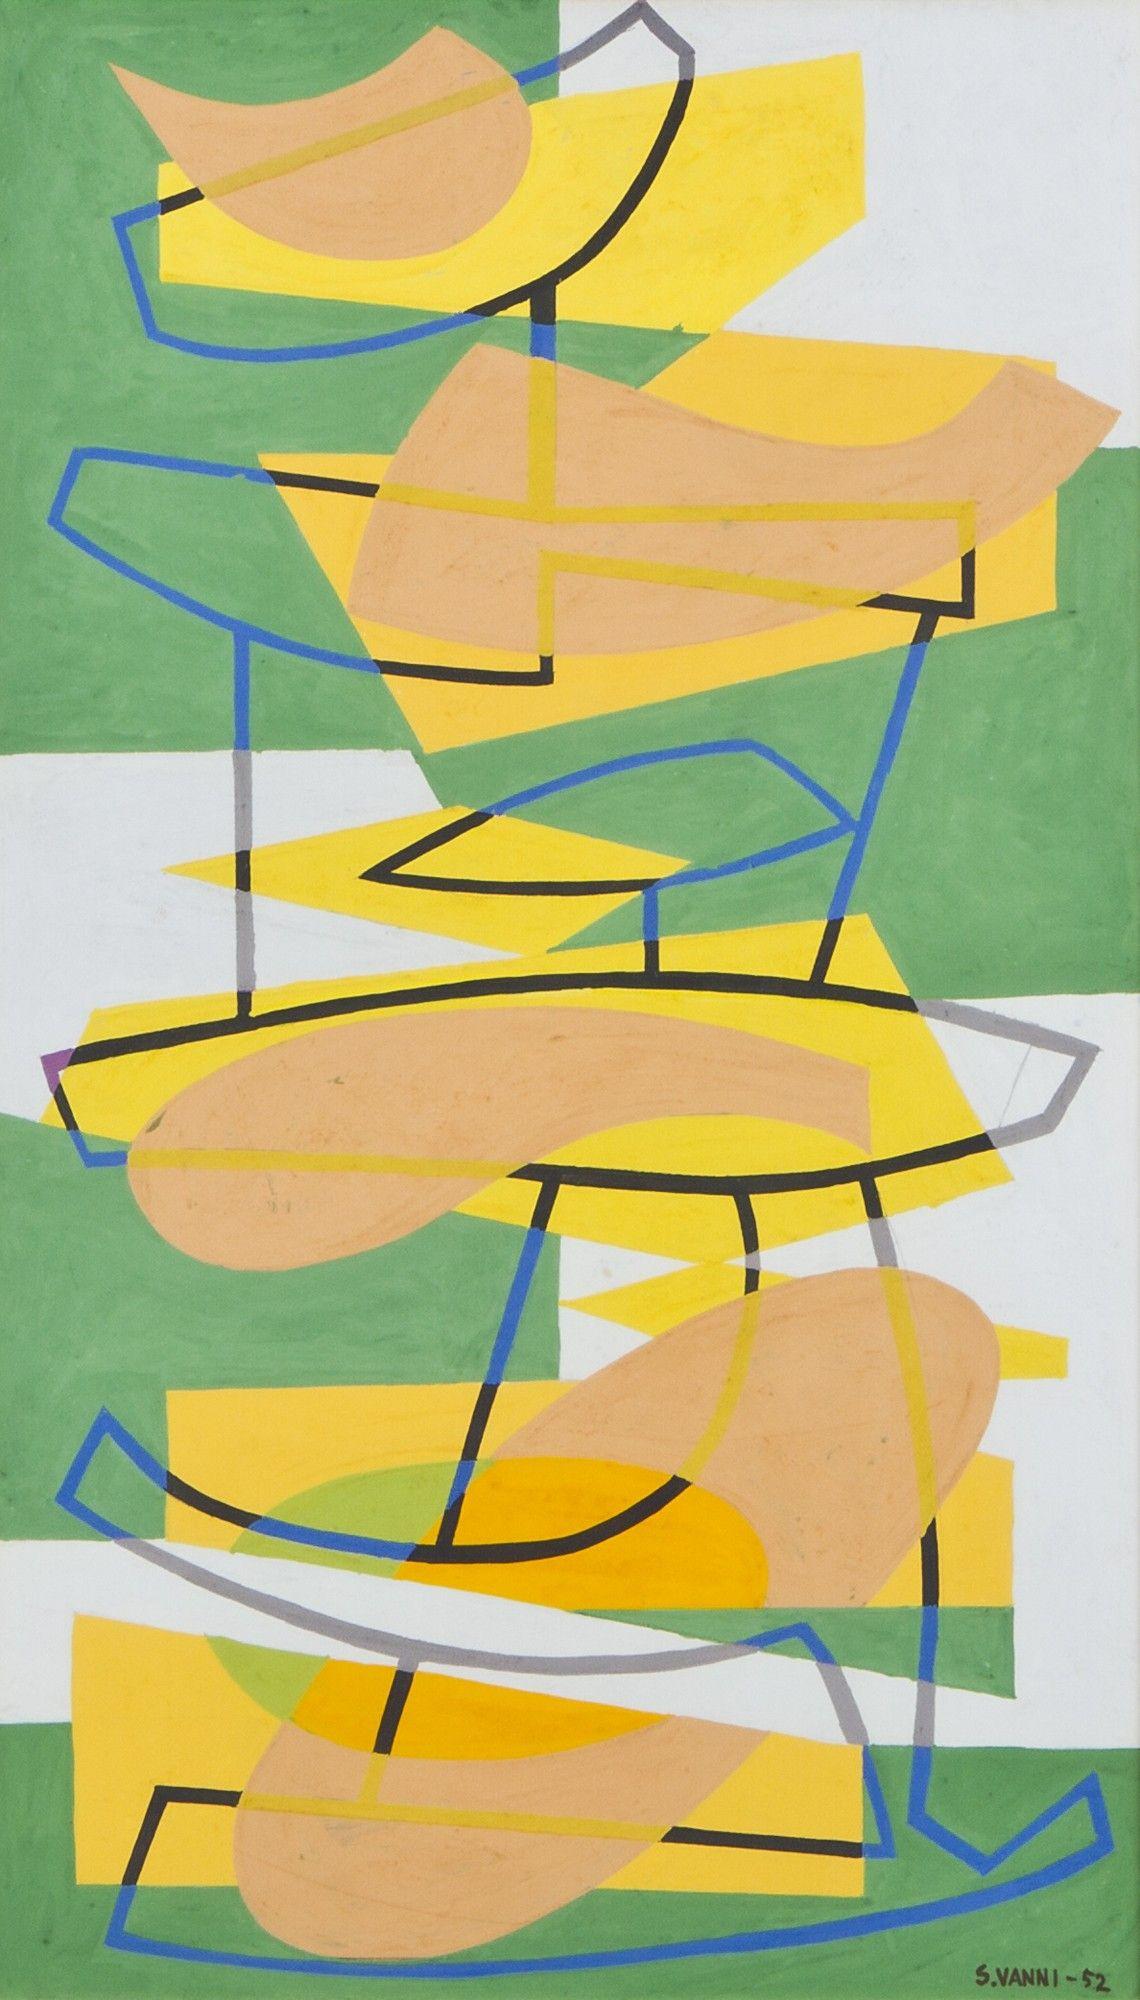 Sam Vanni: Abstrakti, 1952, guassi, 44x26 cm - Hagelstam A135